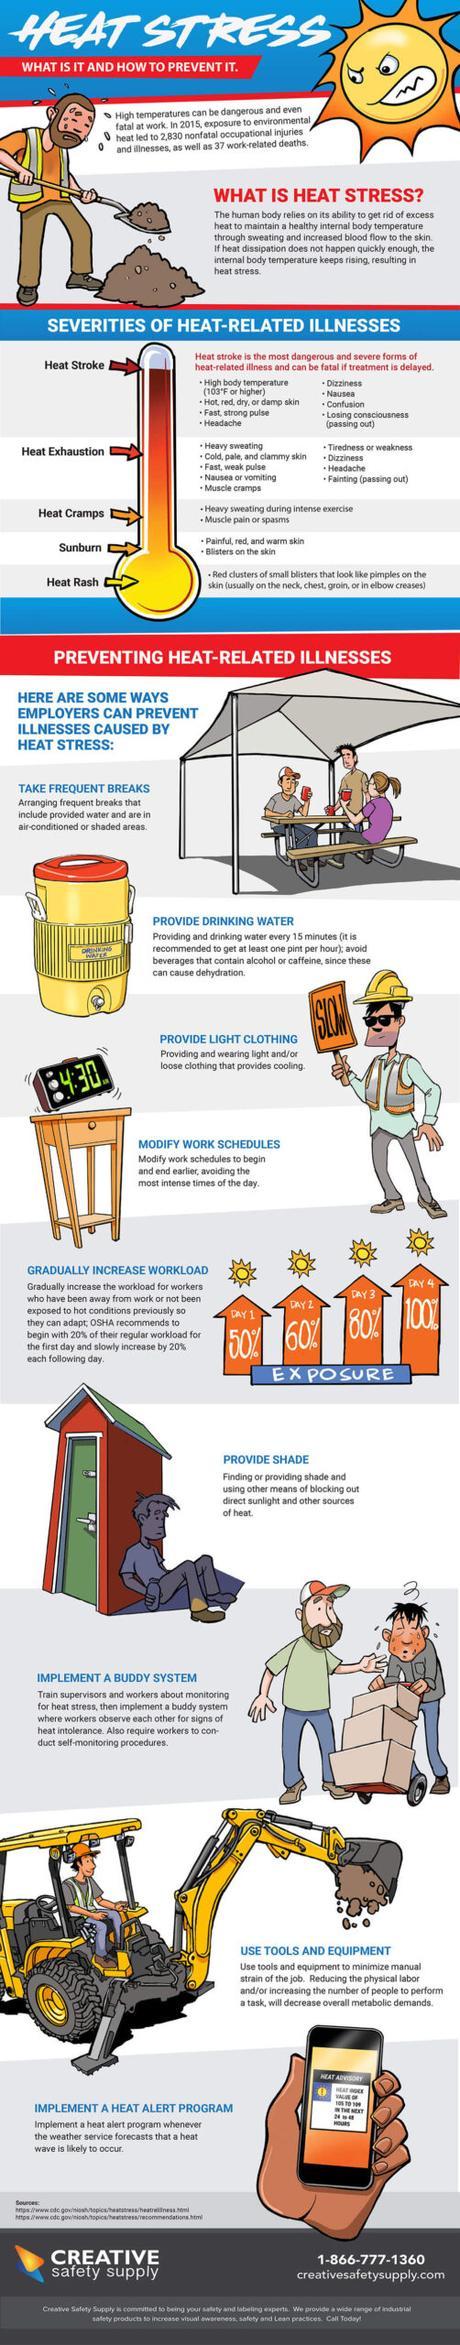 Prevent Heat Stress